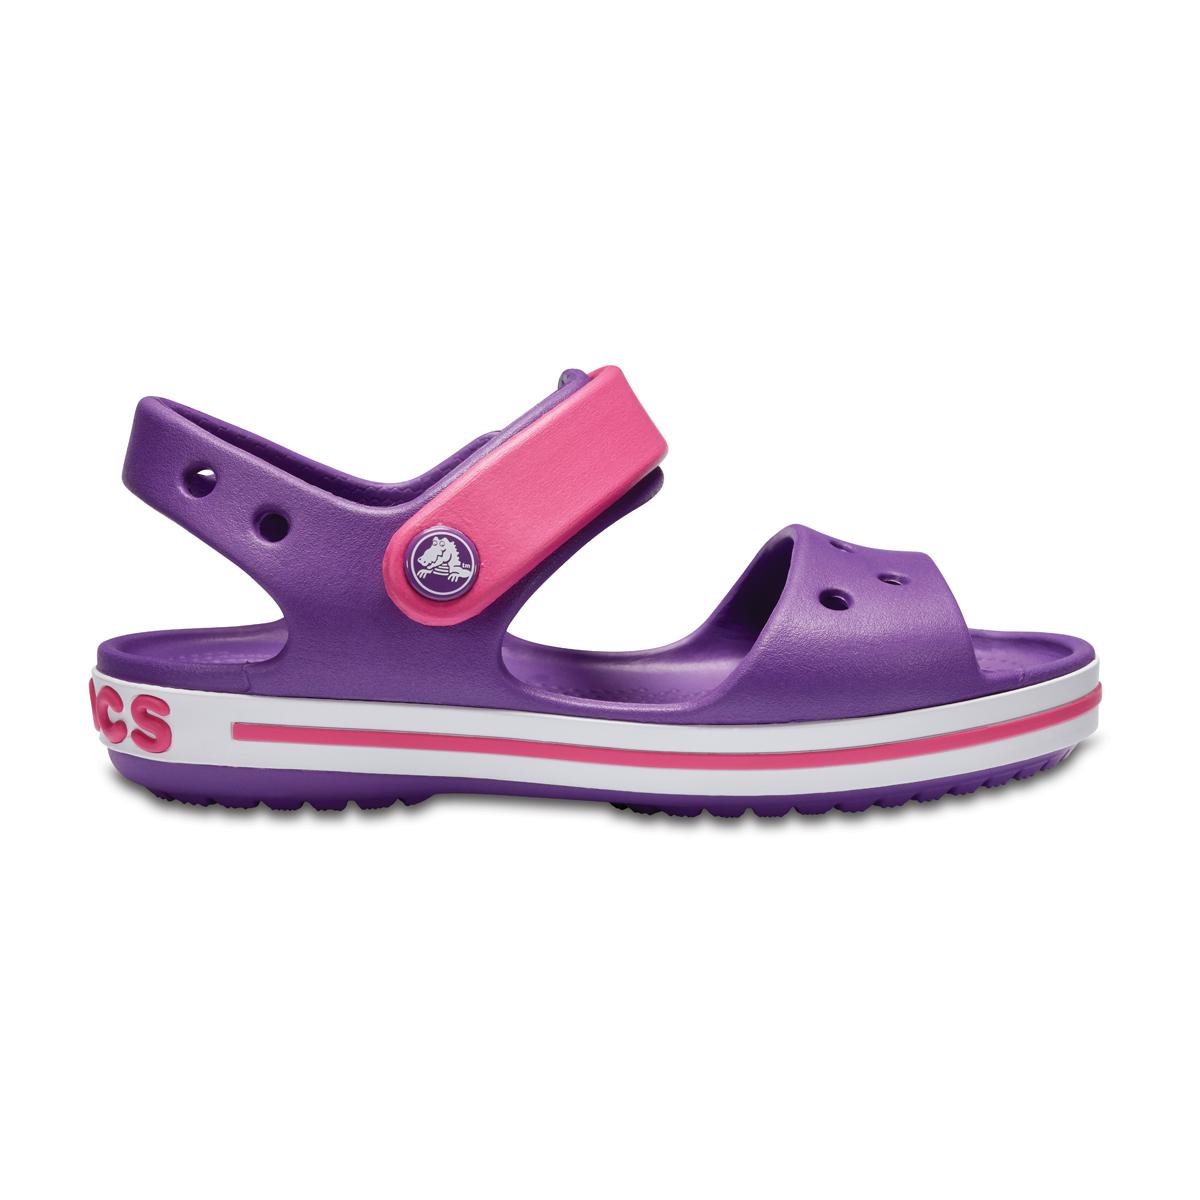 Crocs Crocband Sandal Kids - Ametist/Cennet Pembesi